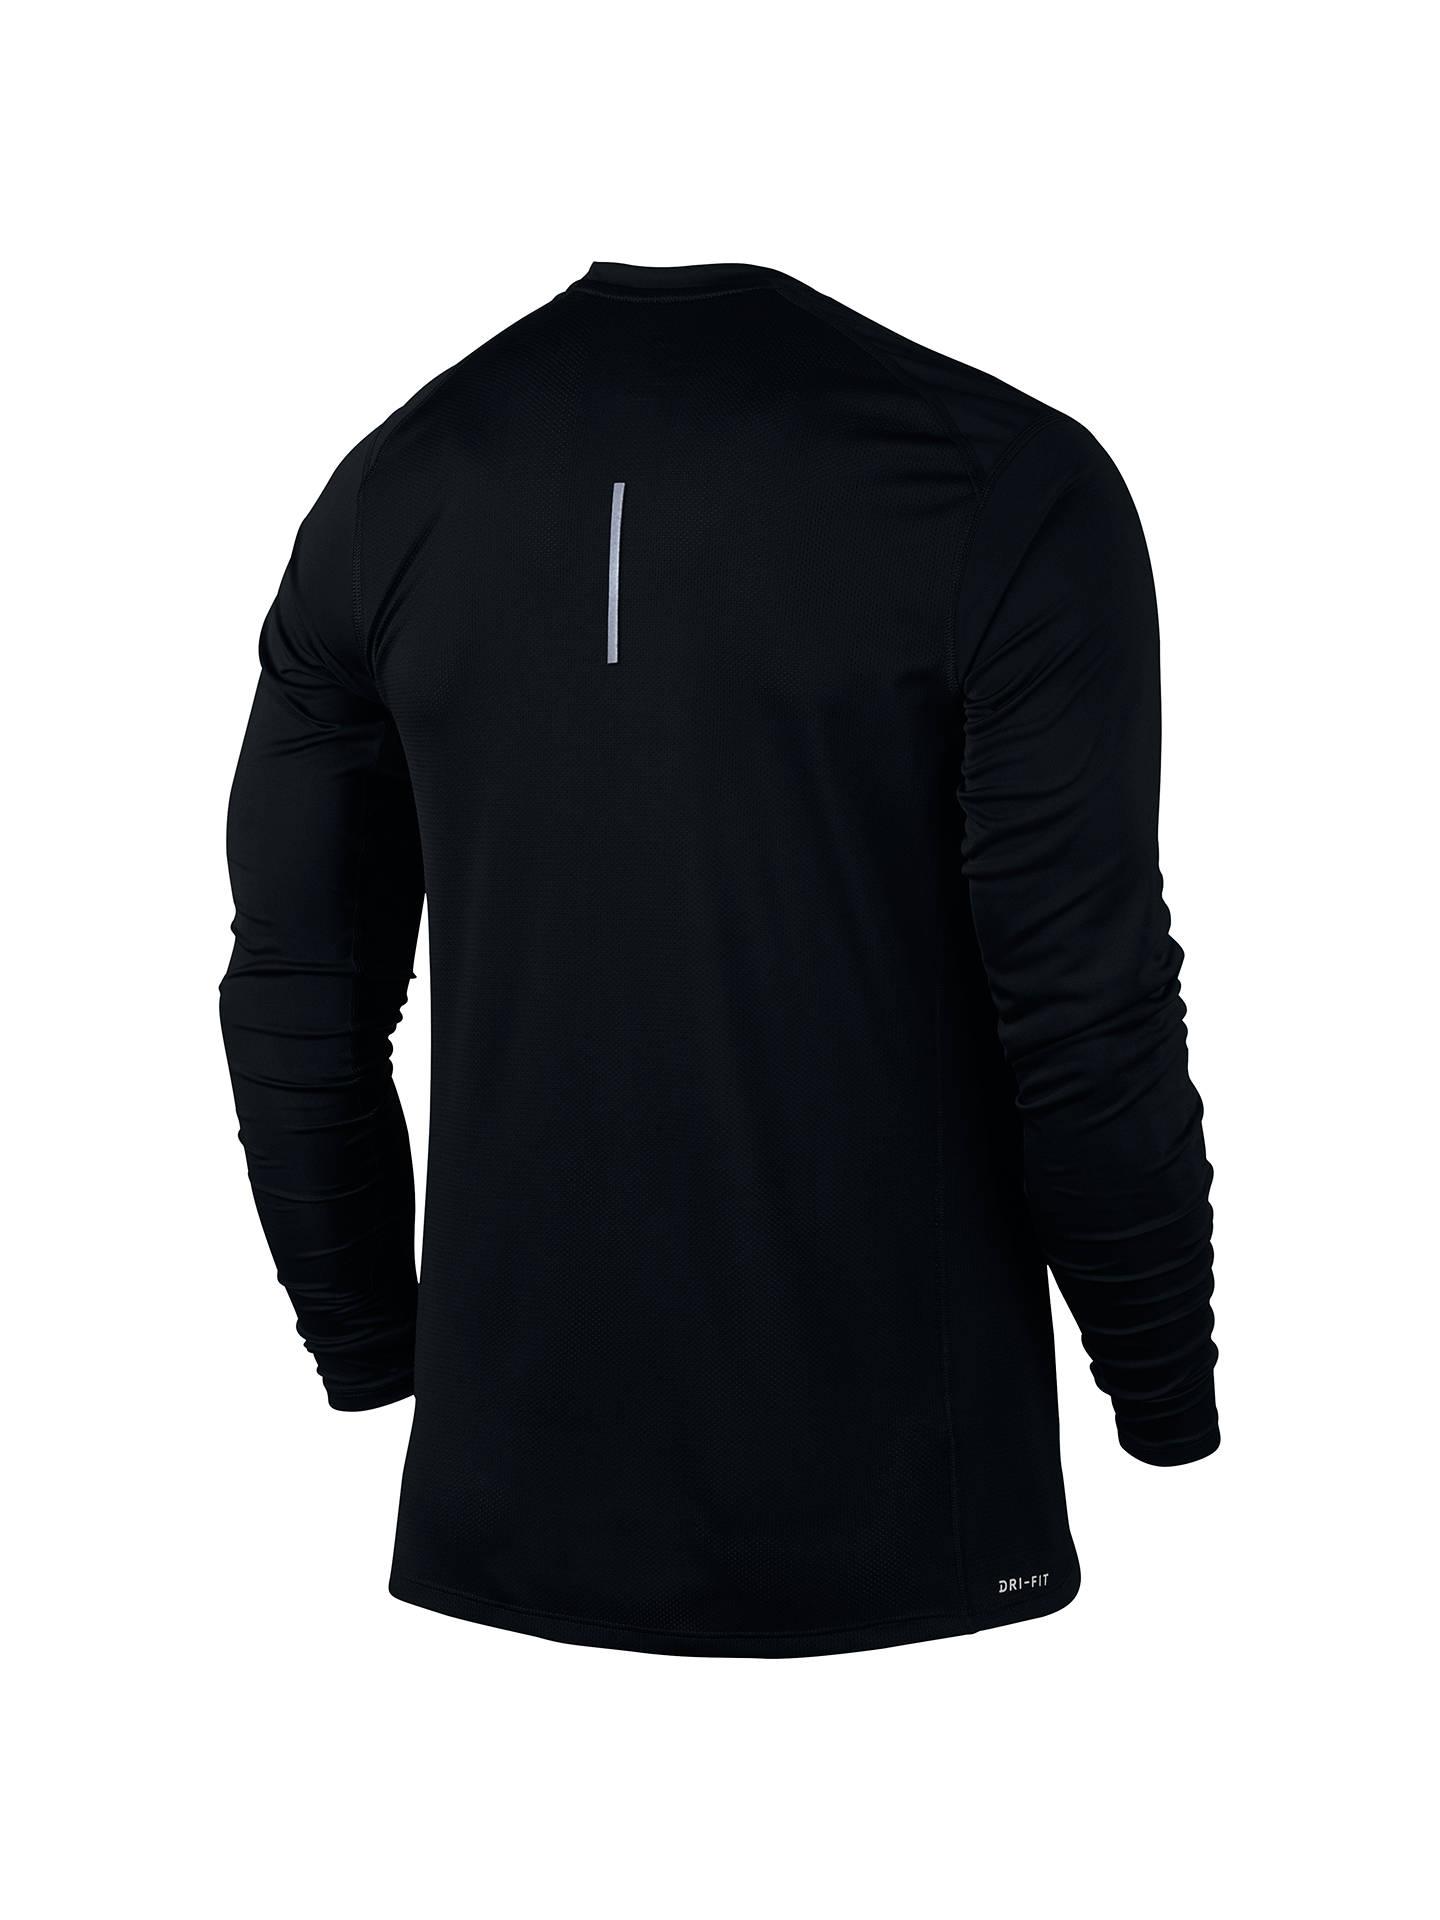 614fc13a0 Buy Nike Dry Miler Long Sleeve Running Top, Black, S Online at johnlewis.